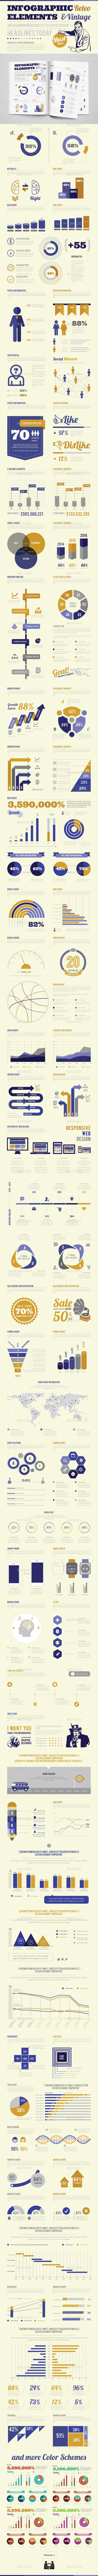 GraphicRiver Vintage & Retro Style Infographic 11802469